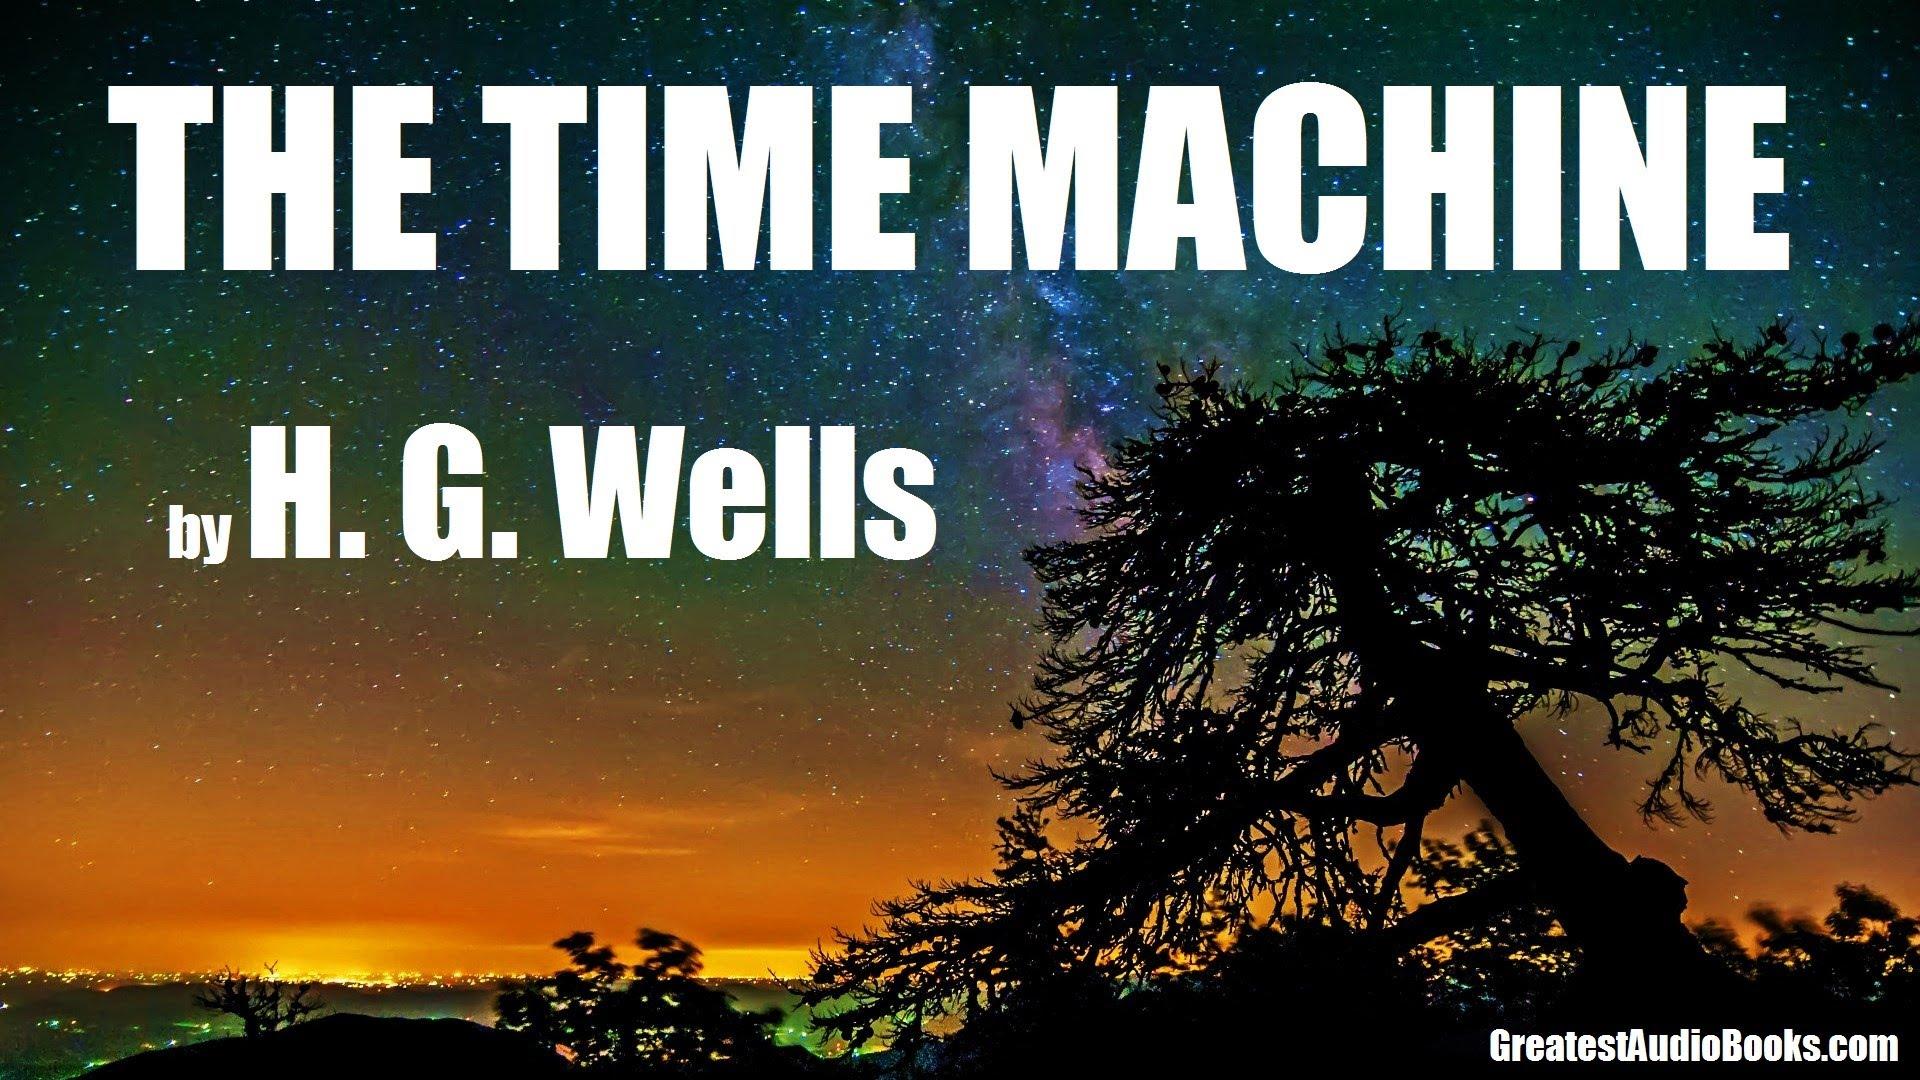 Himanshi Reviews: The Time Machine